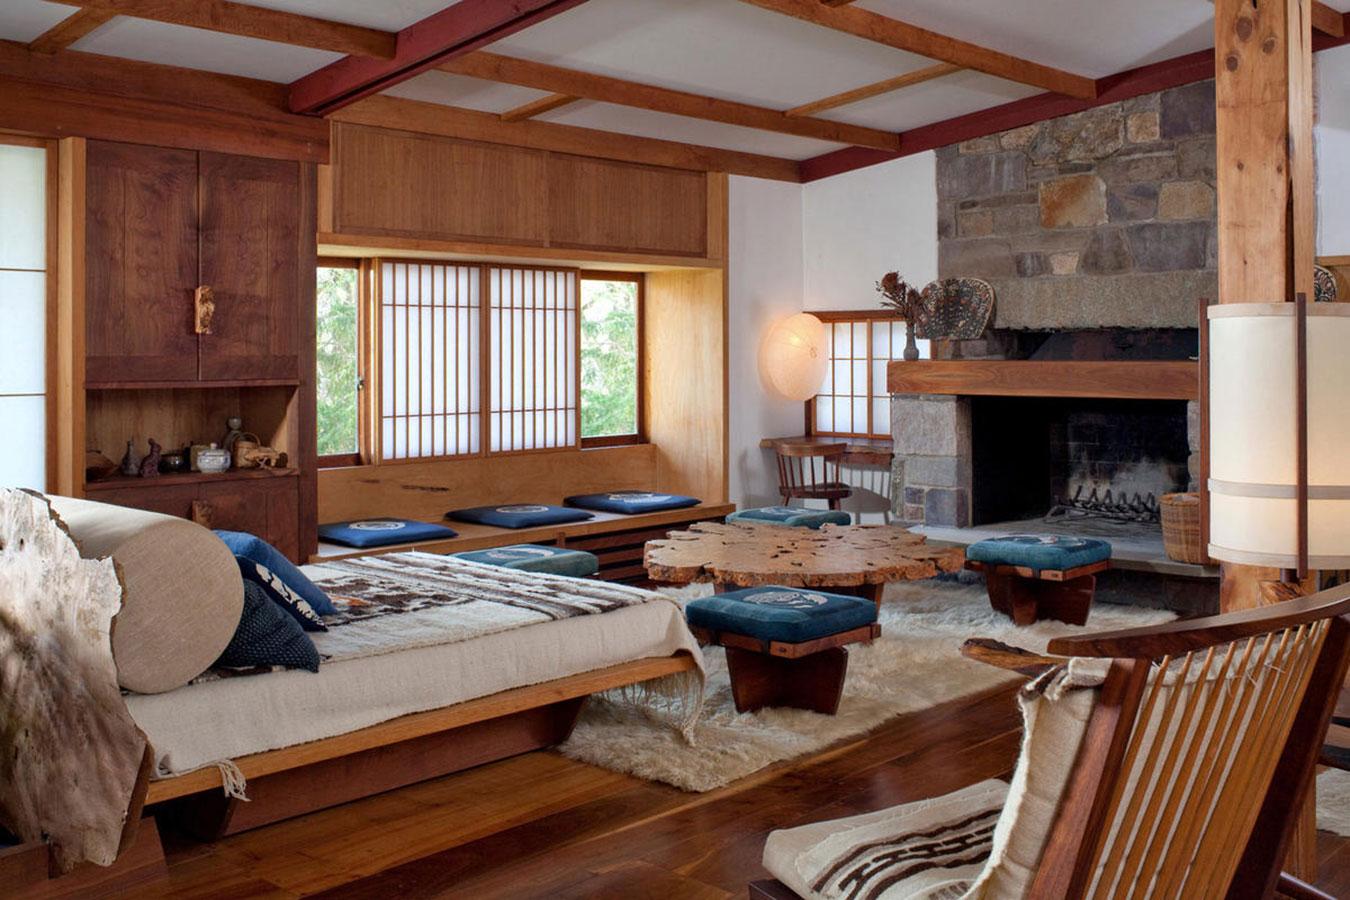 George Nakashima's home